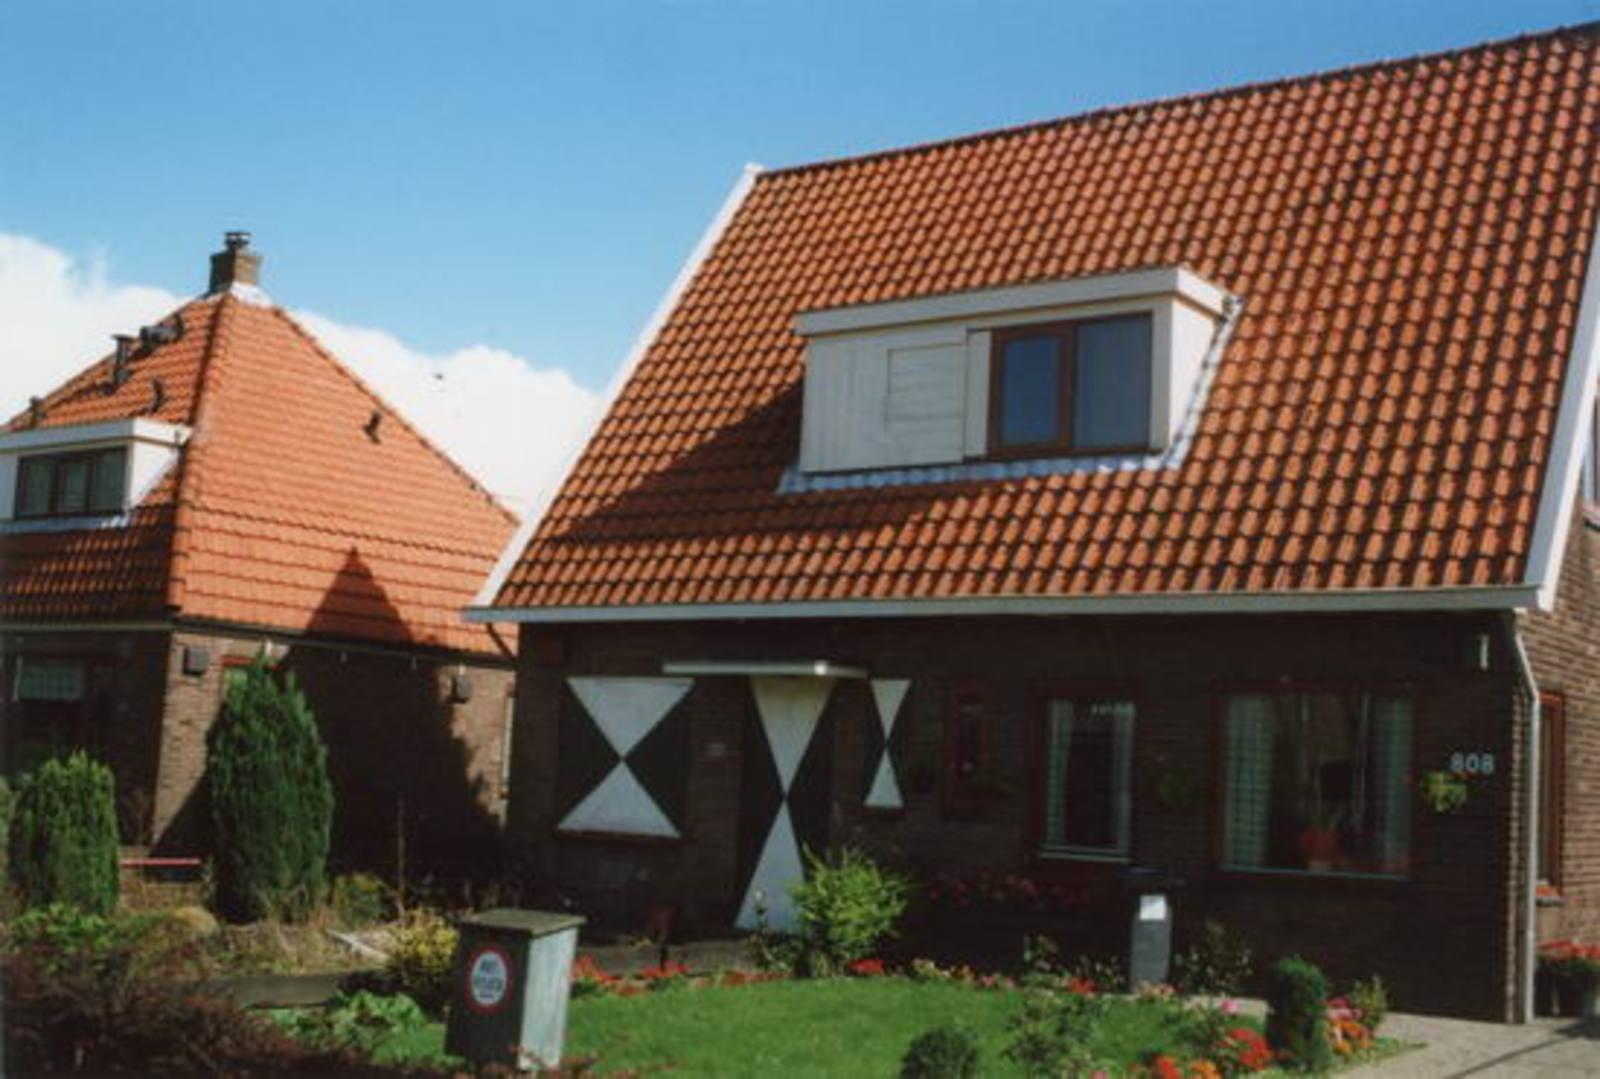 Rijnlanderweg O 0806-808 2001 Huize 18